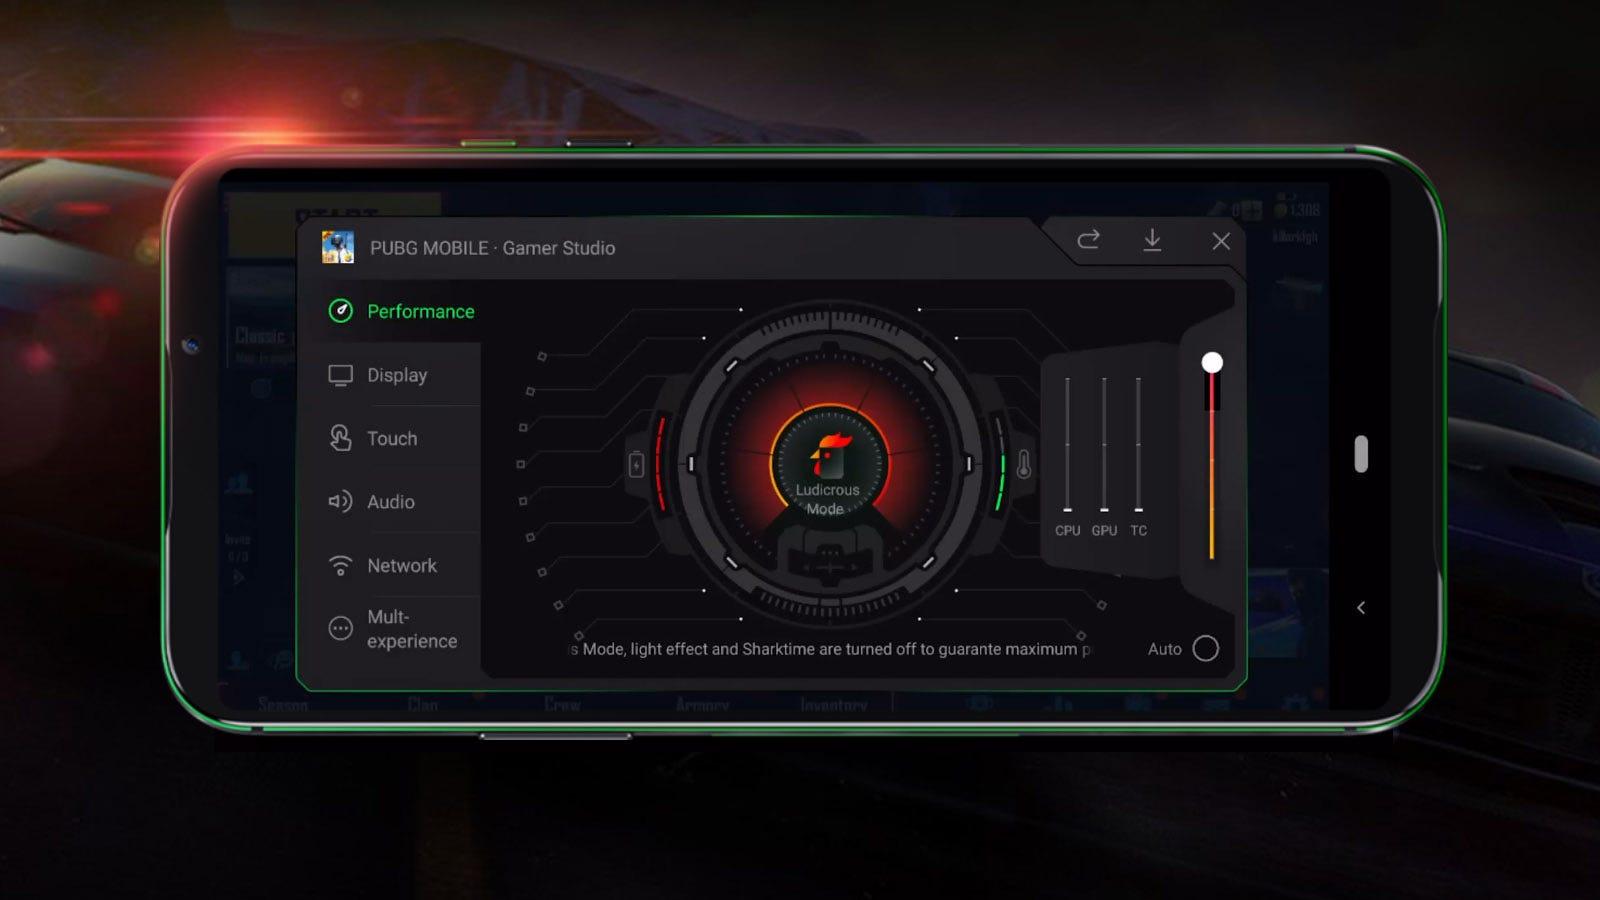 A Black Shark phone Performance menu set to Ludicrous Mode.